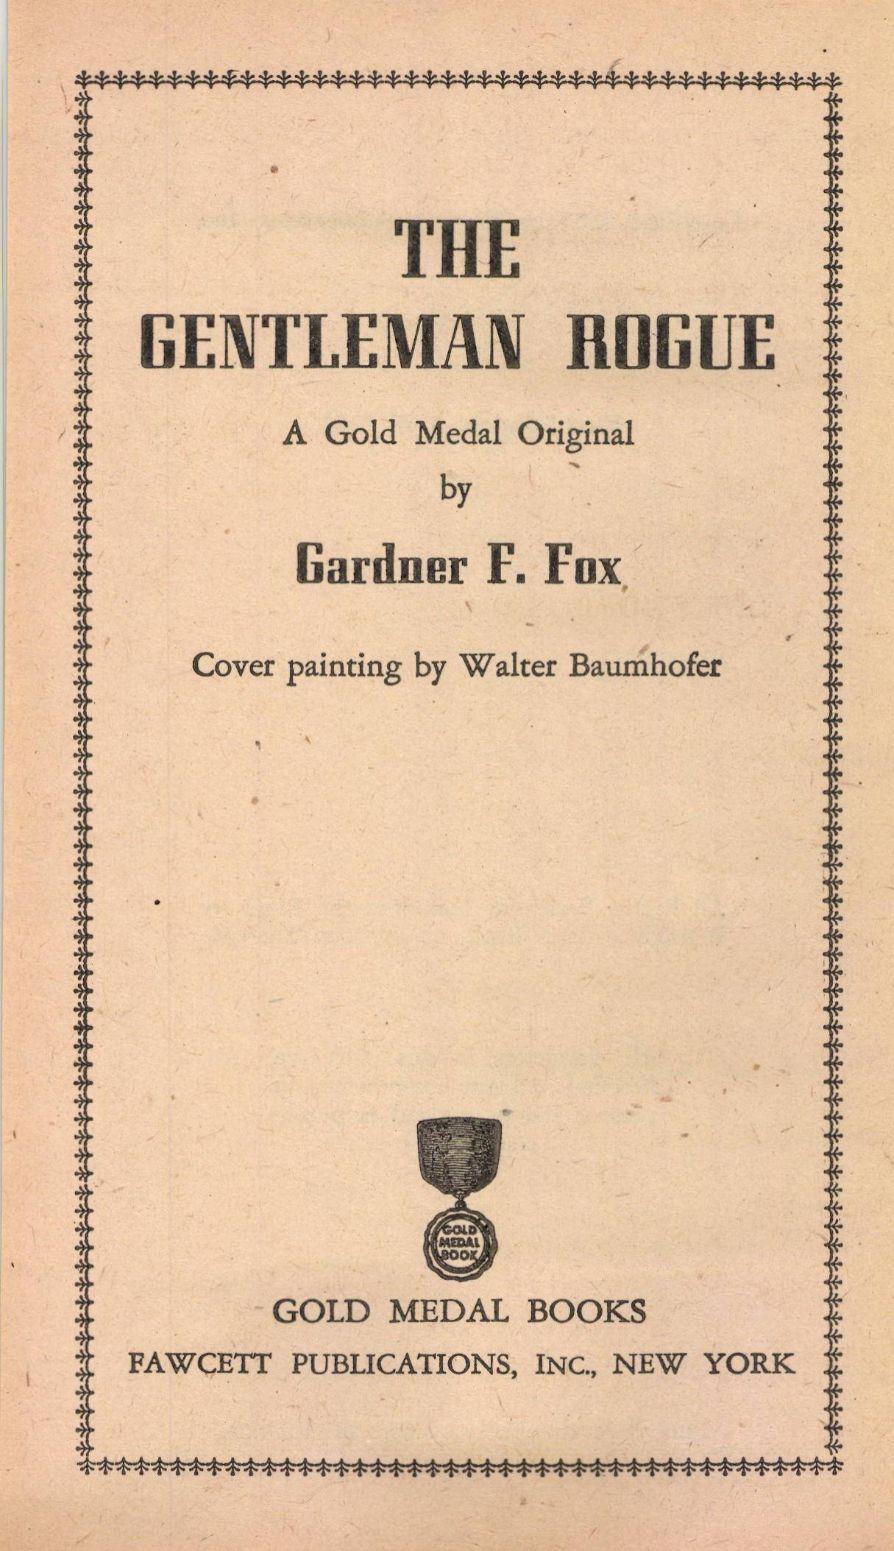 Gentleman Rogue Gardner F Fox 004.jpg